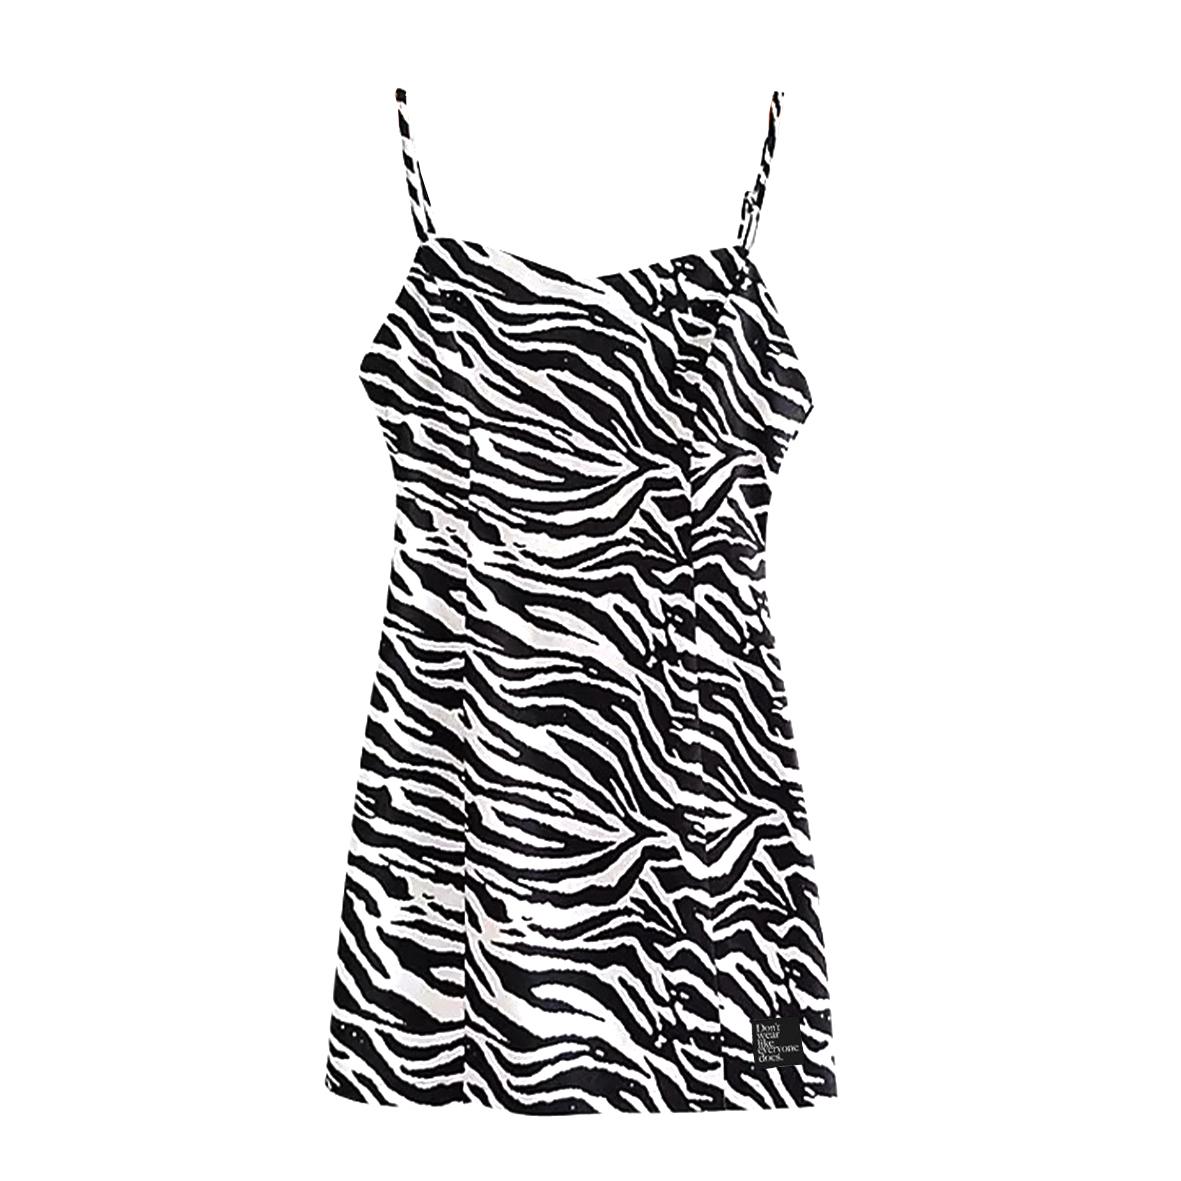 【Cat & Parfum】Zebra Mini Dress